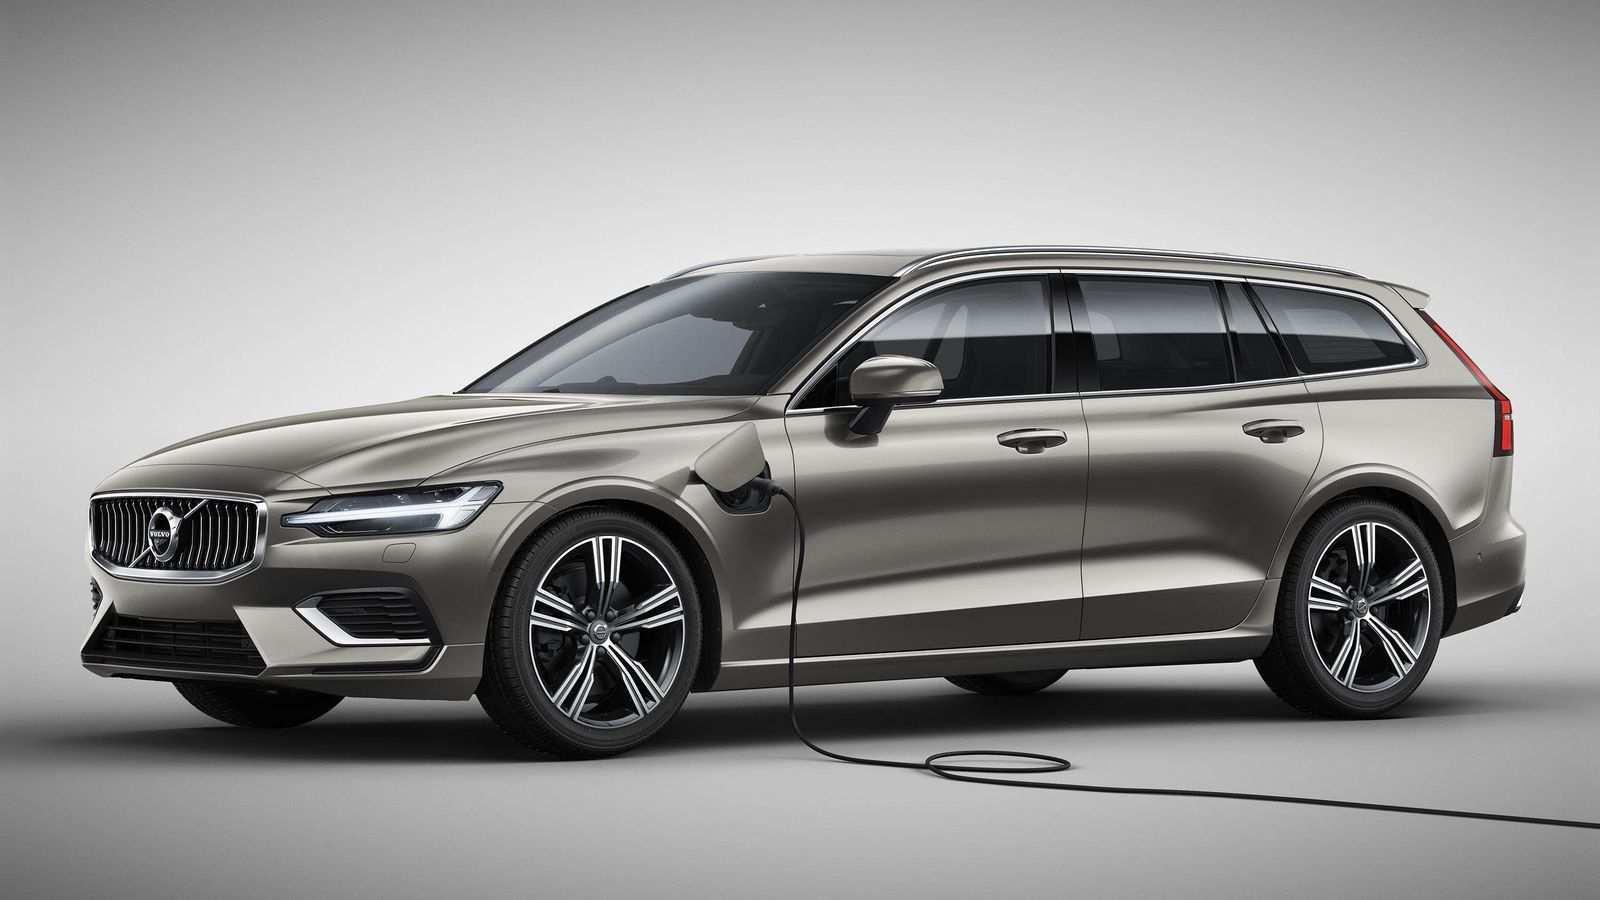 69 Concept of Volvo Hybrid 2019 Price New Engine Pricing by Volvo Hybrid 2019 Price New Engine